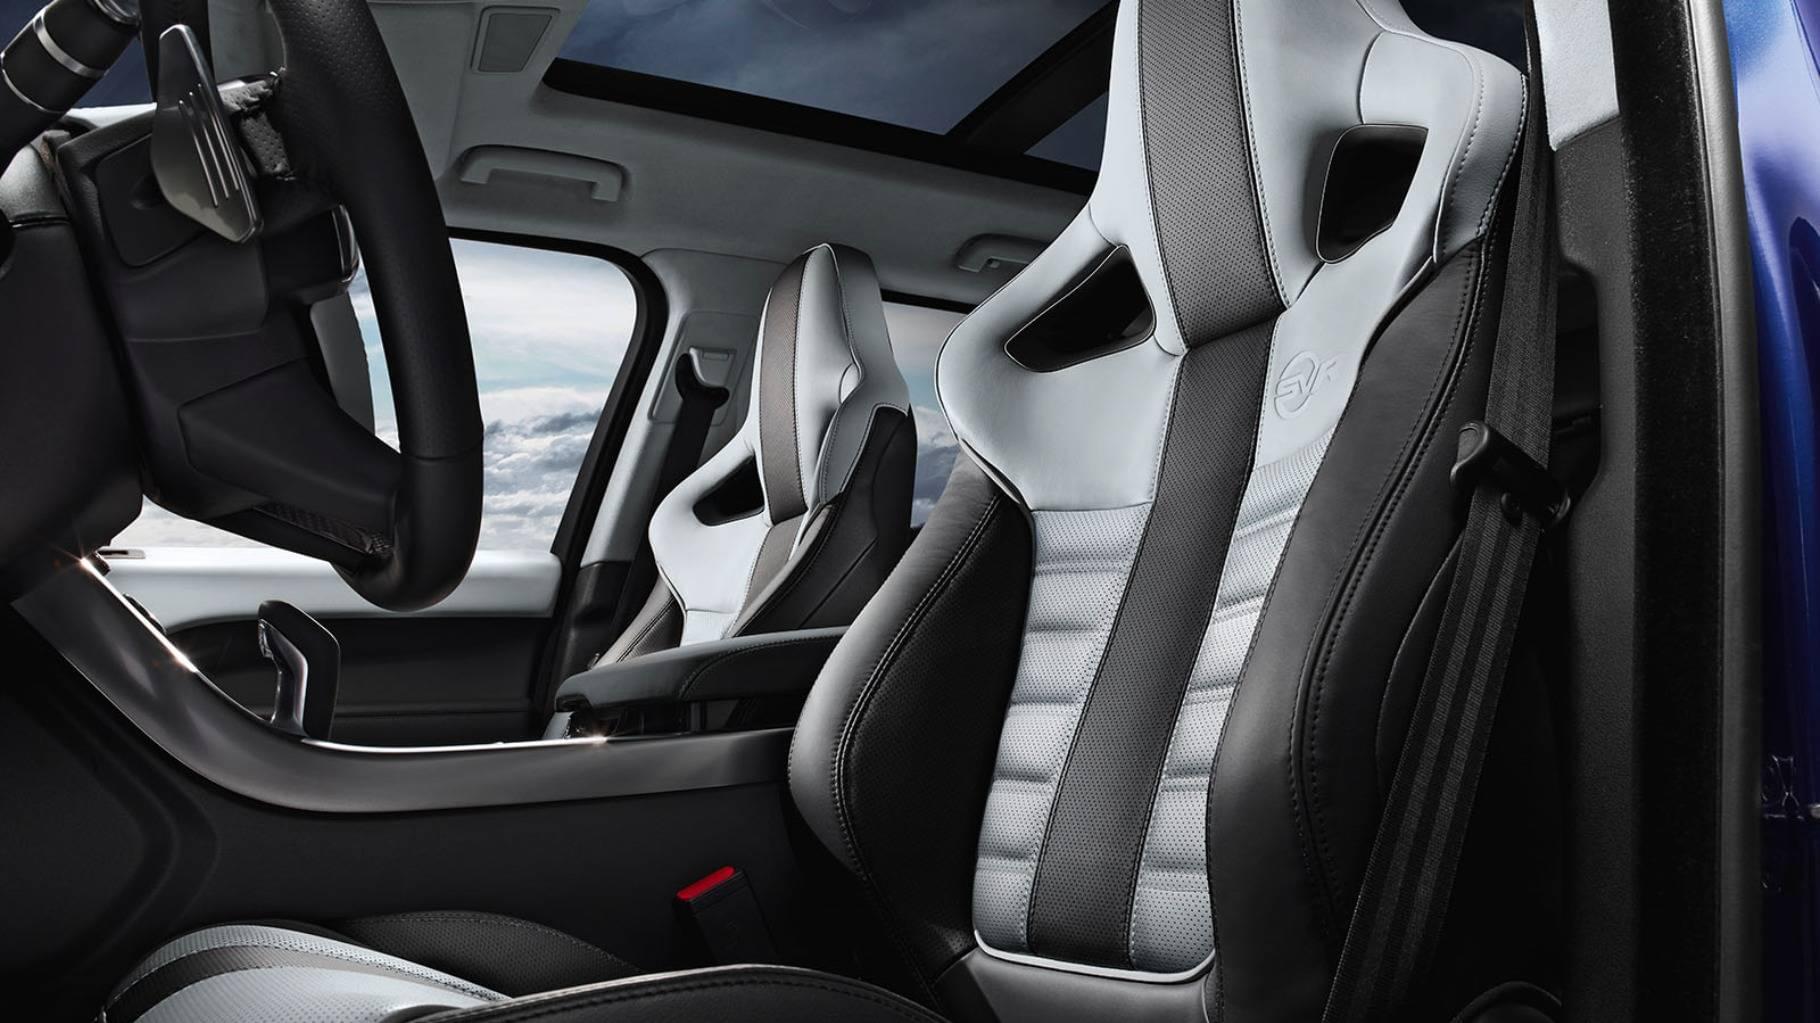 2017 Land Rover Range Rover Sport Interior